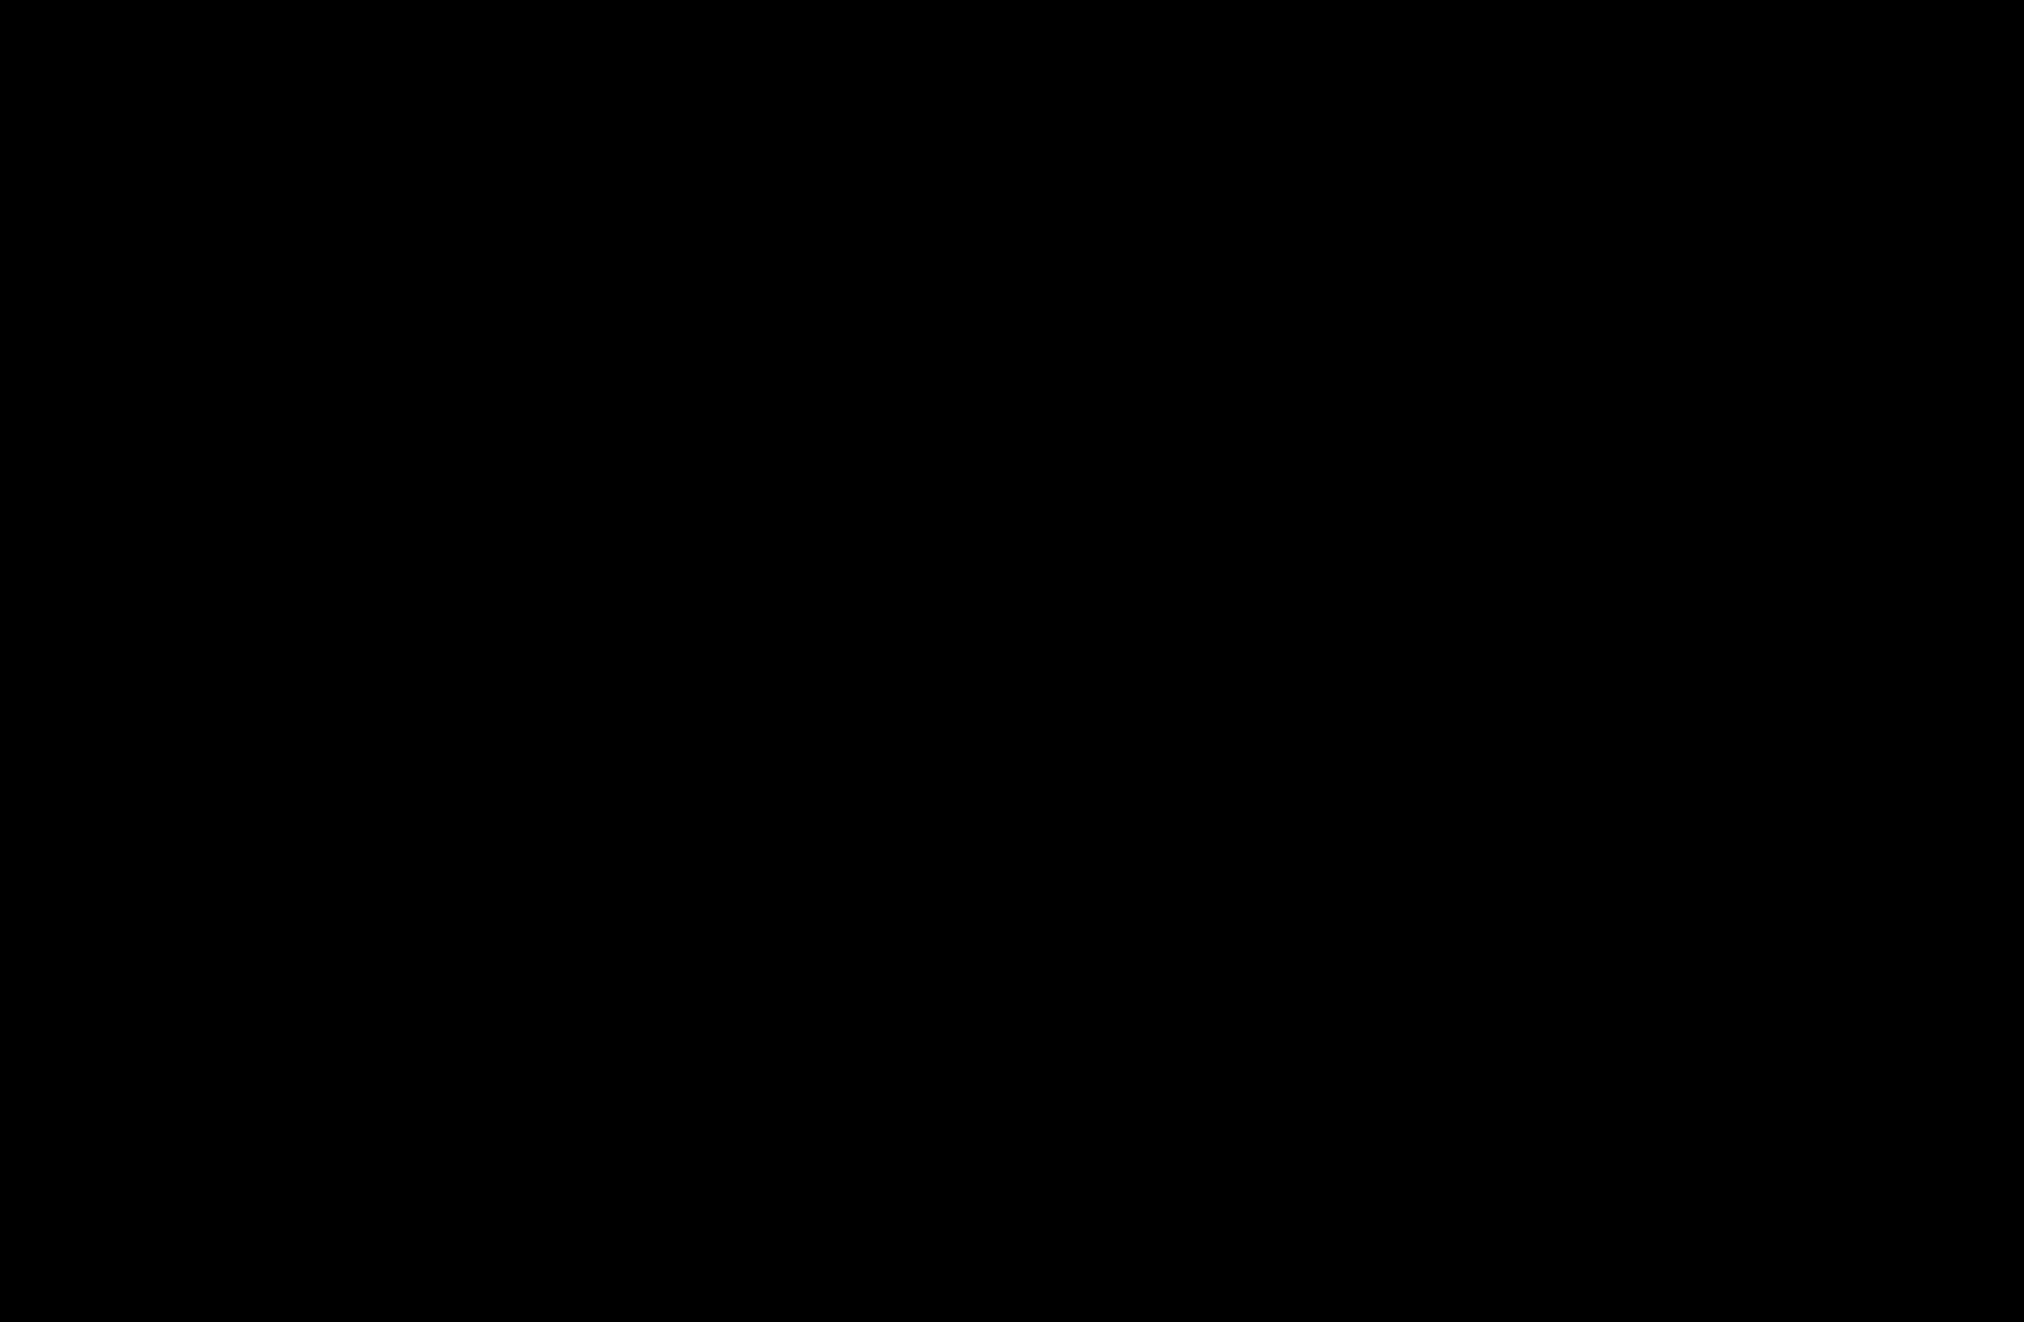 GBR 12909 dihydrochloride